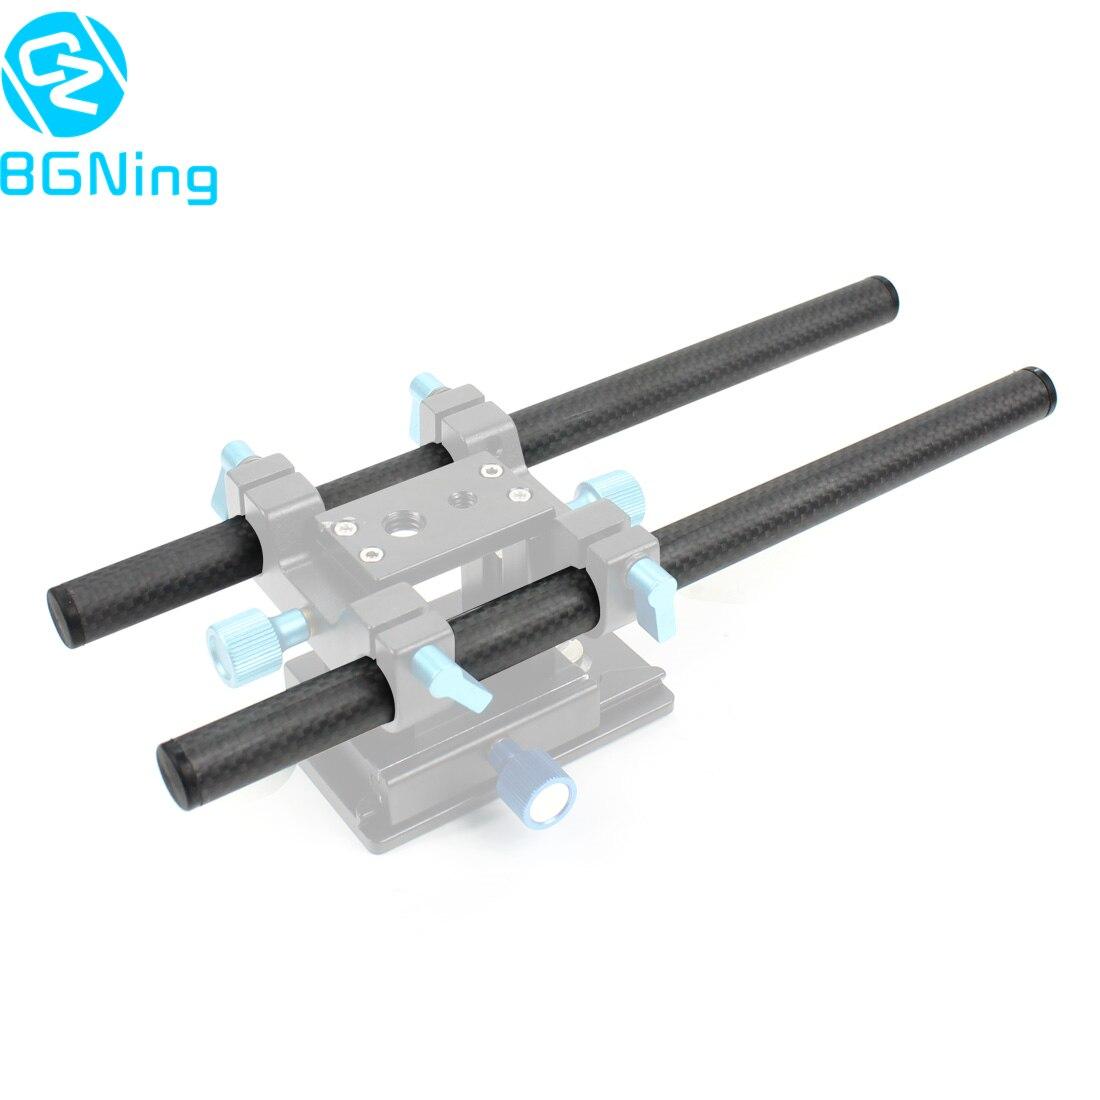 2Pcs 10cm / 25cm /30cm / 40cm Carbon Fiber Tube Rod For Dia 15mm Rod Rail System Follow Focus Camera Cage Kit